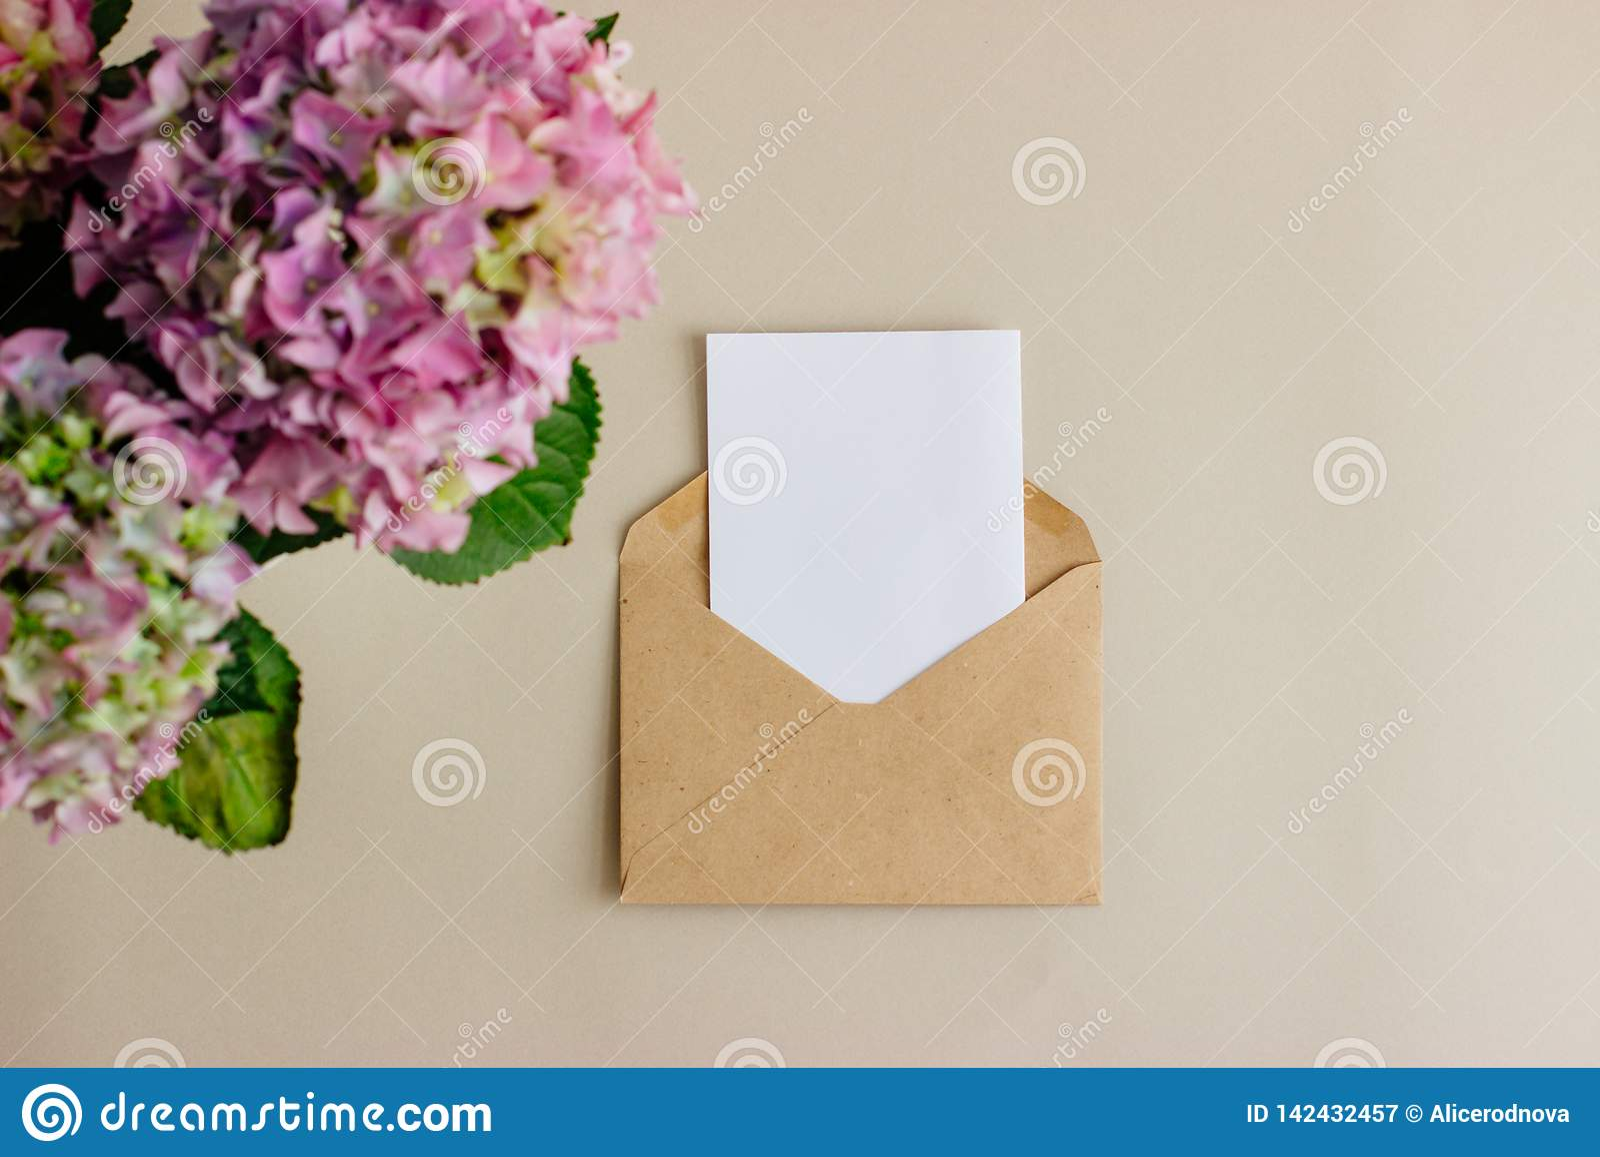 Kraft paper envelope with white card on light background.